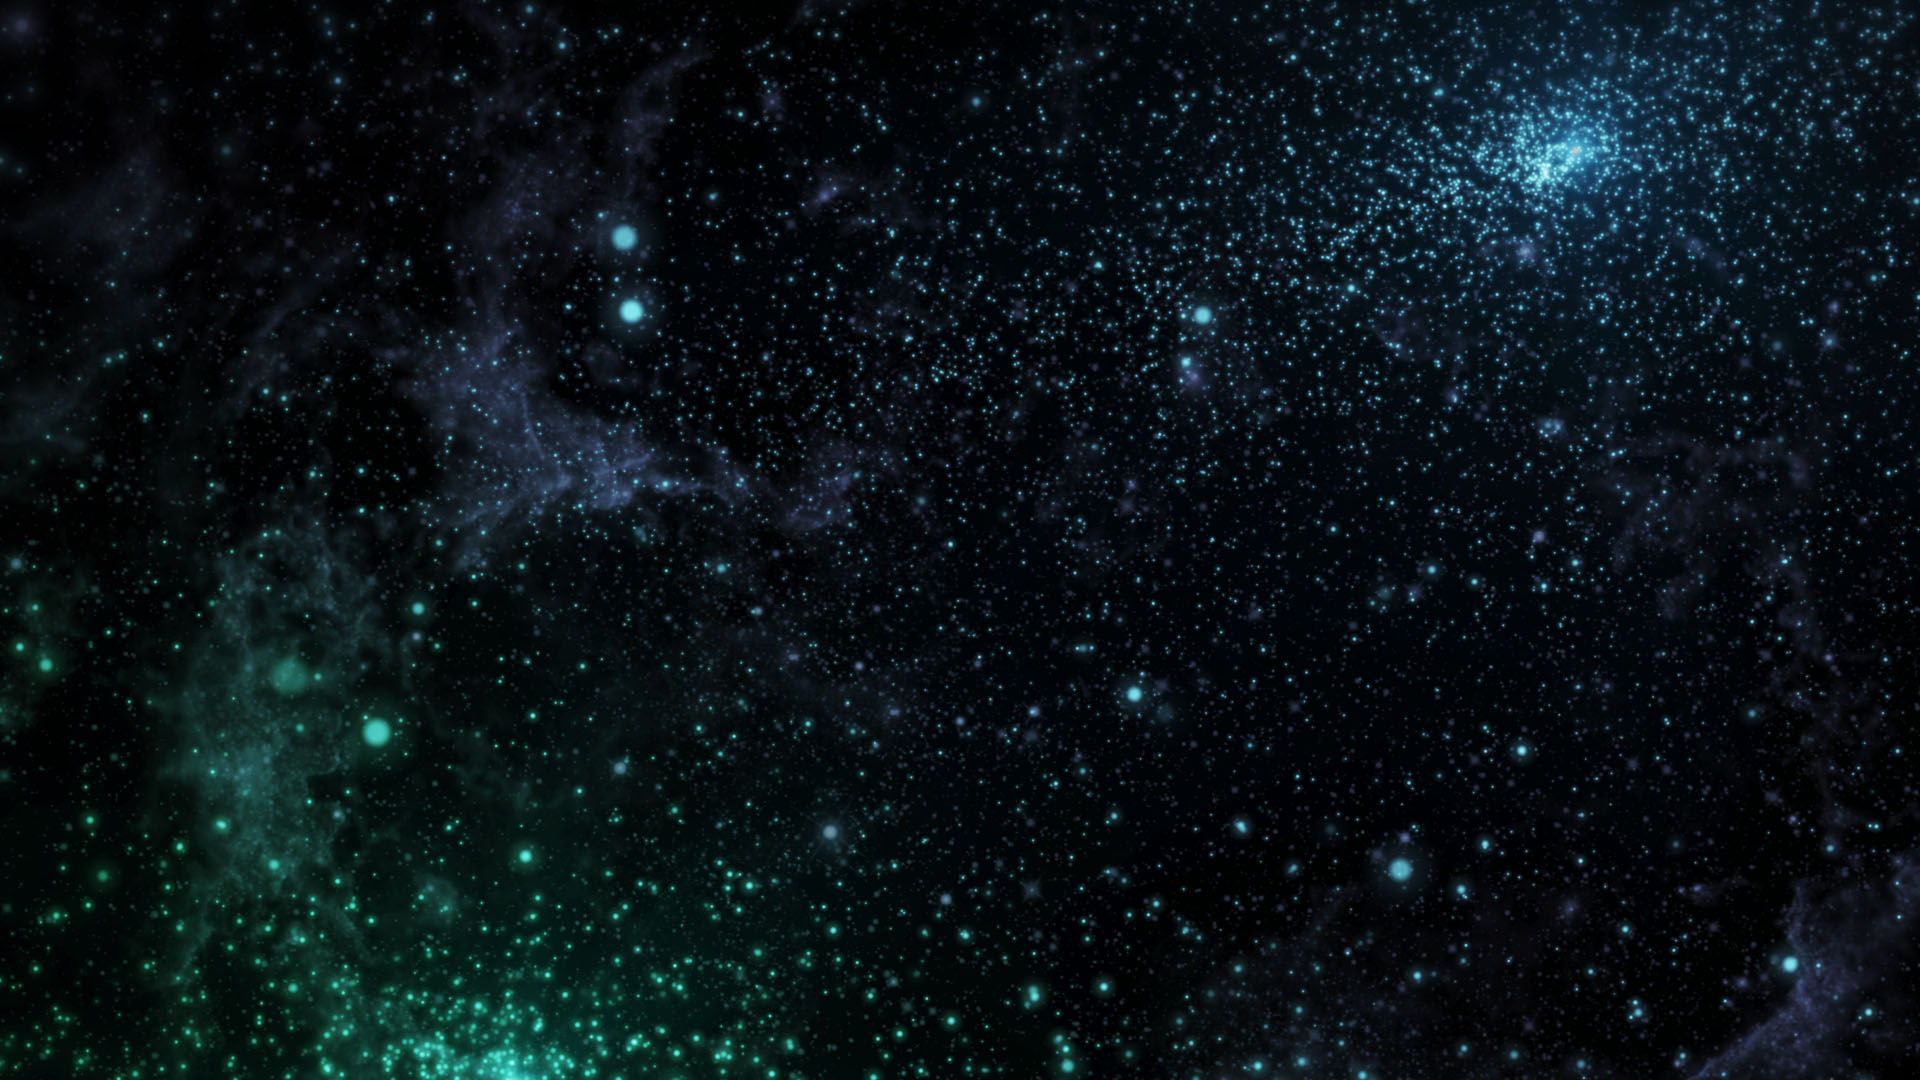 Deep Space Wallpaper - Widescreen HD Wallpapers